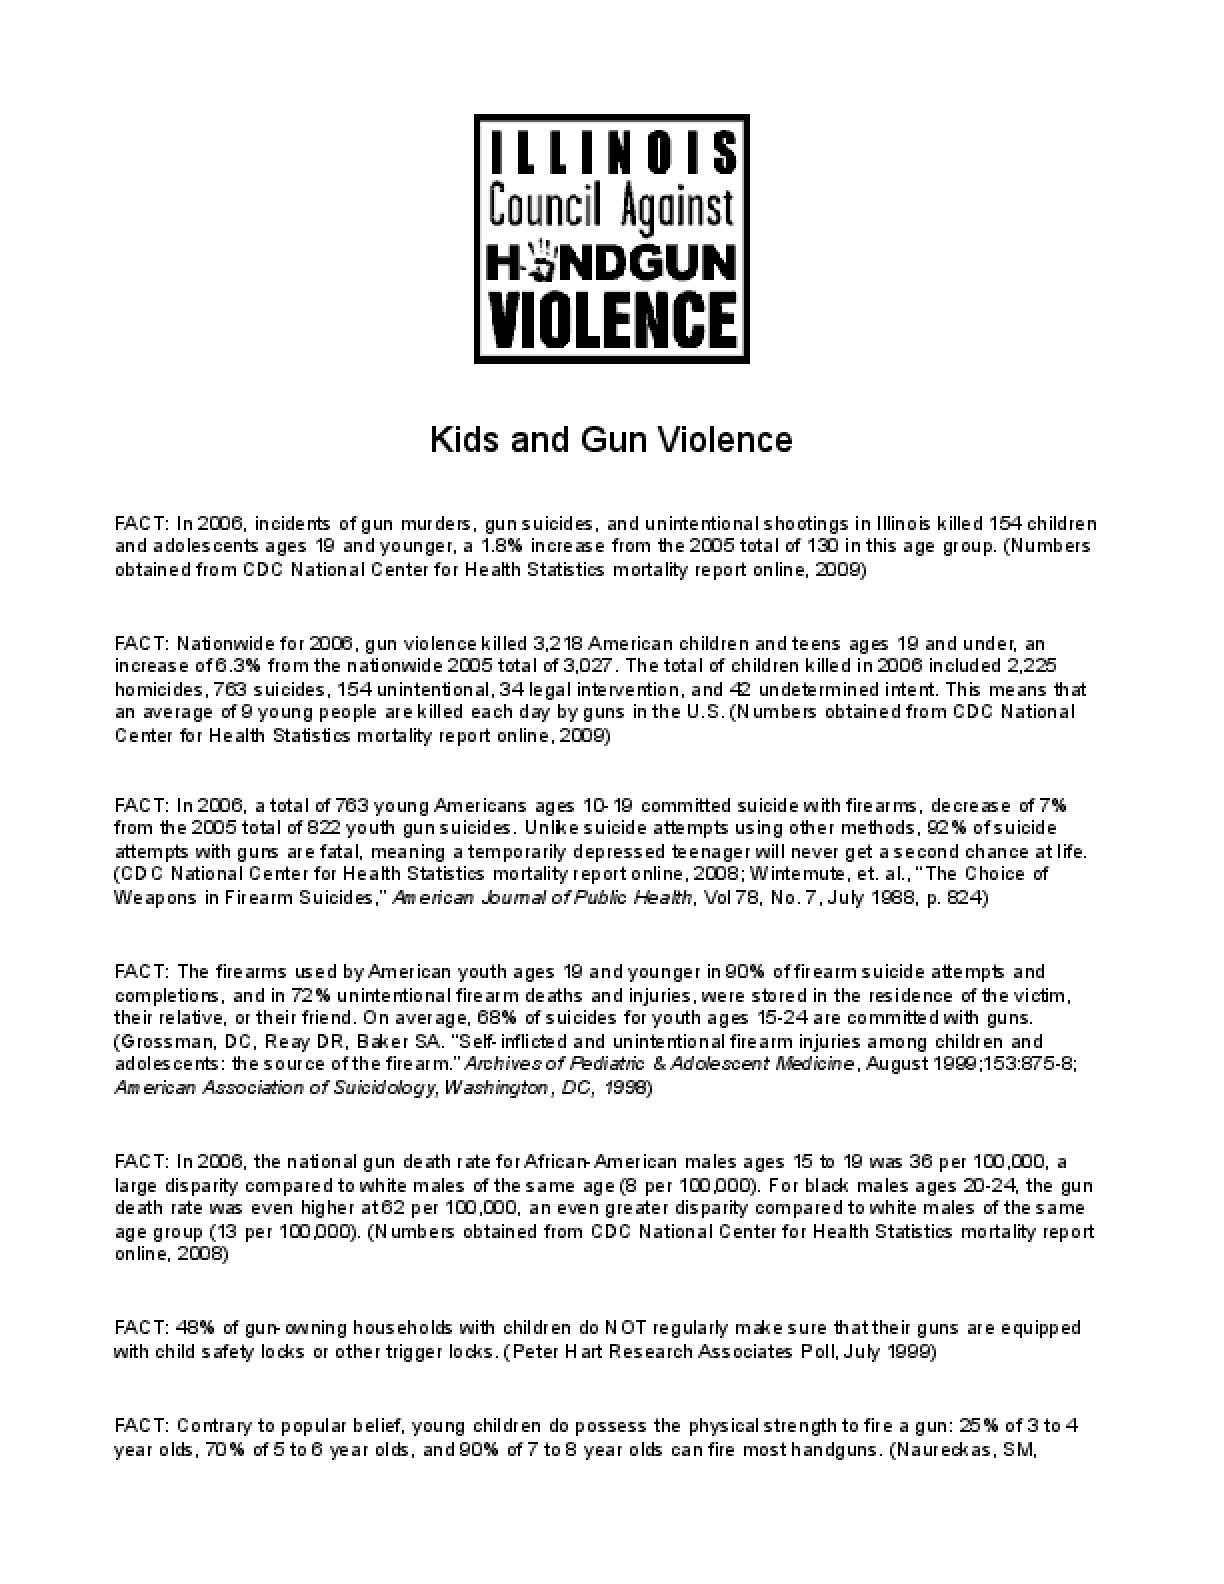 Kids and Gun Violence Factsheet